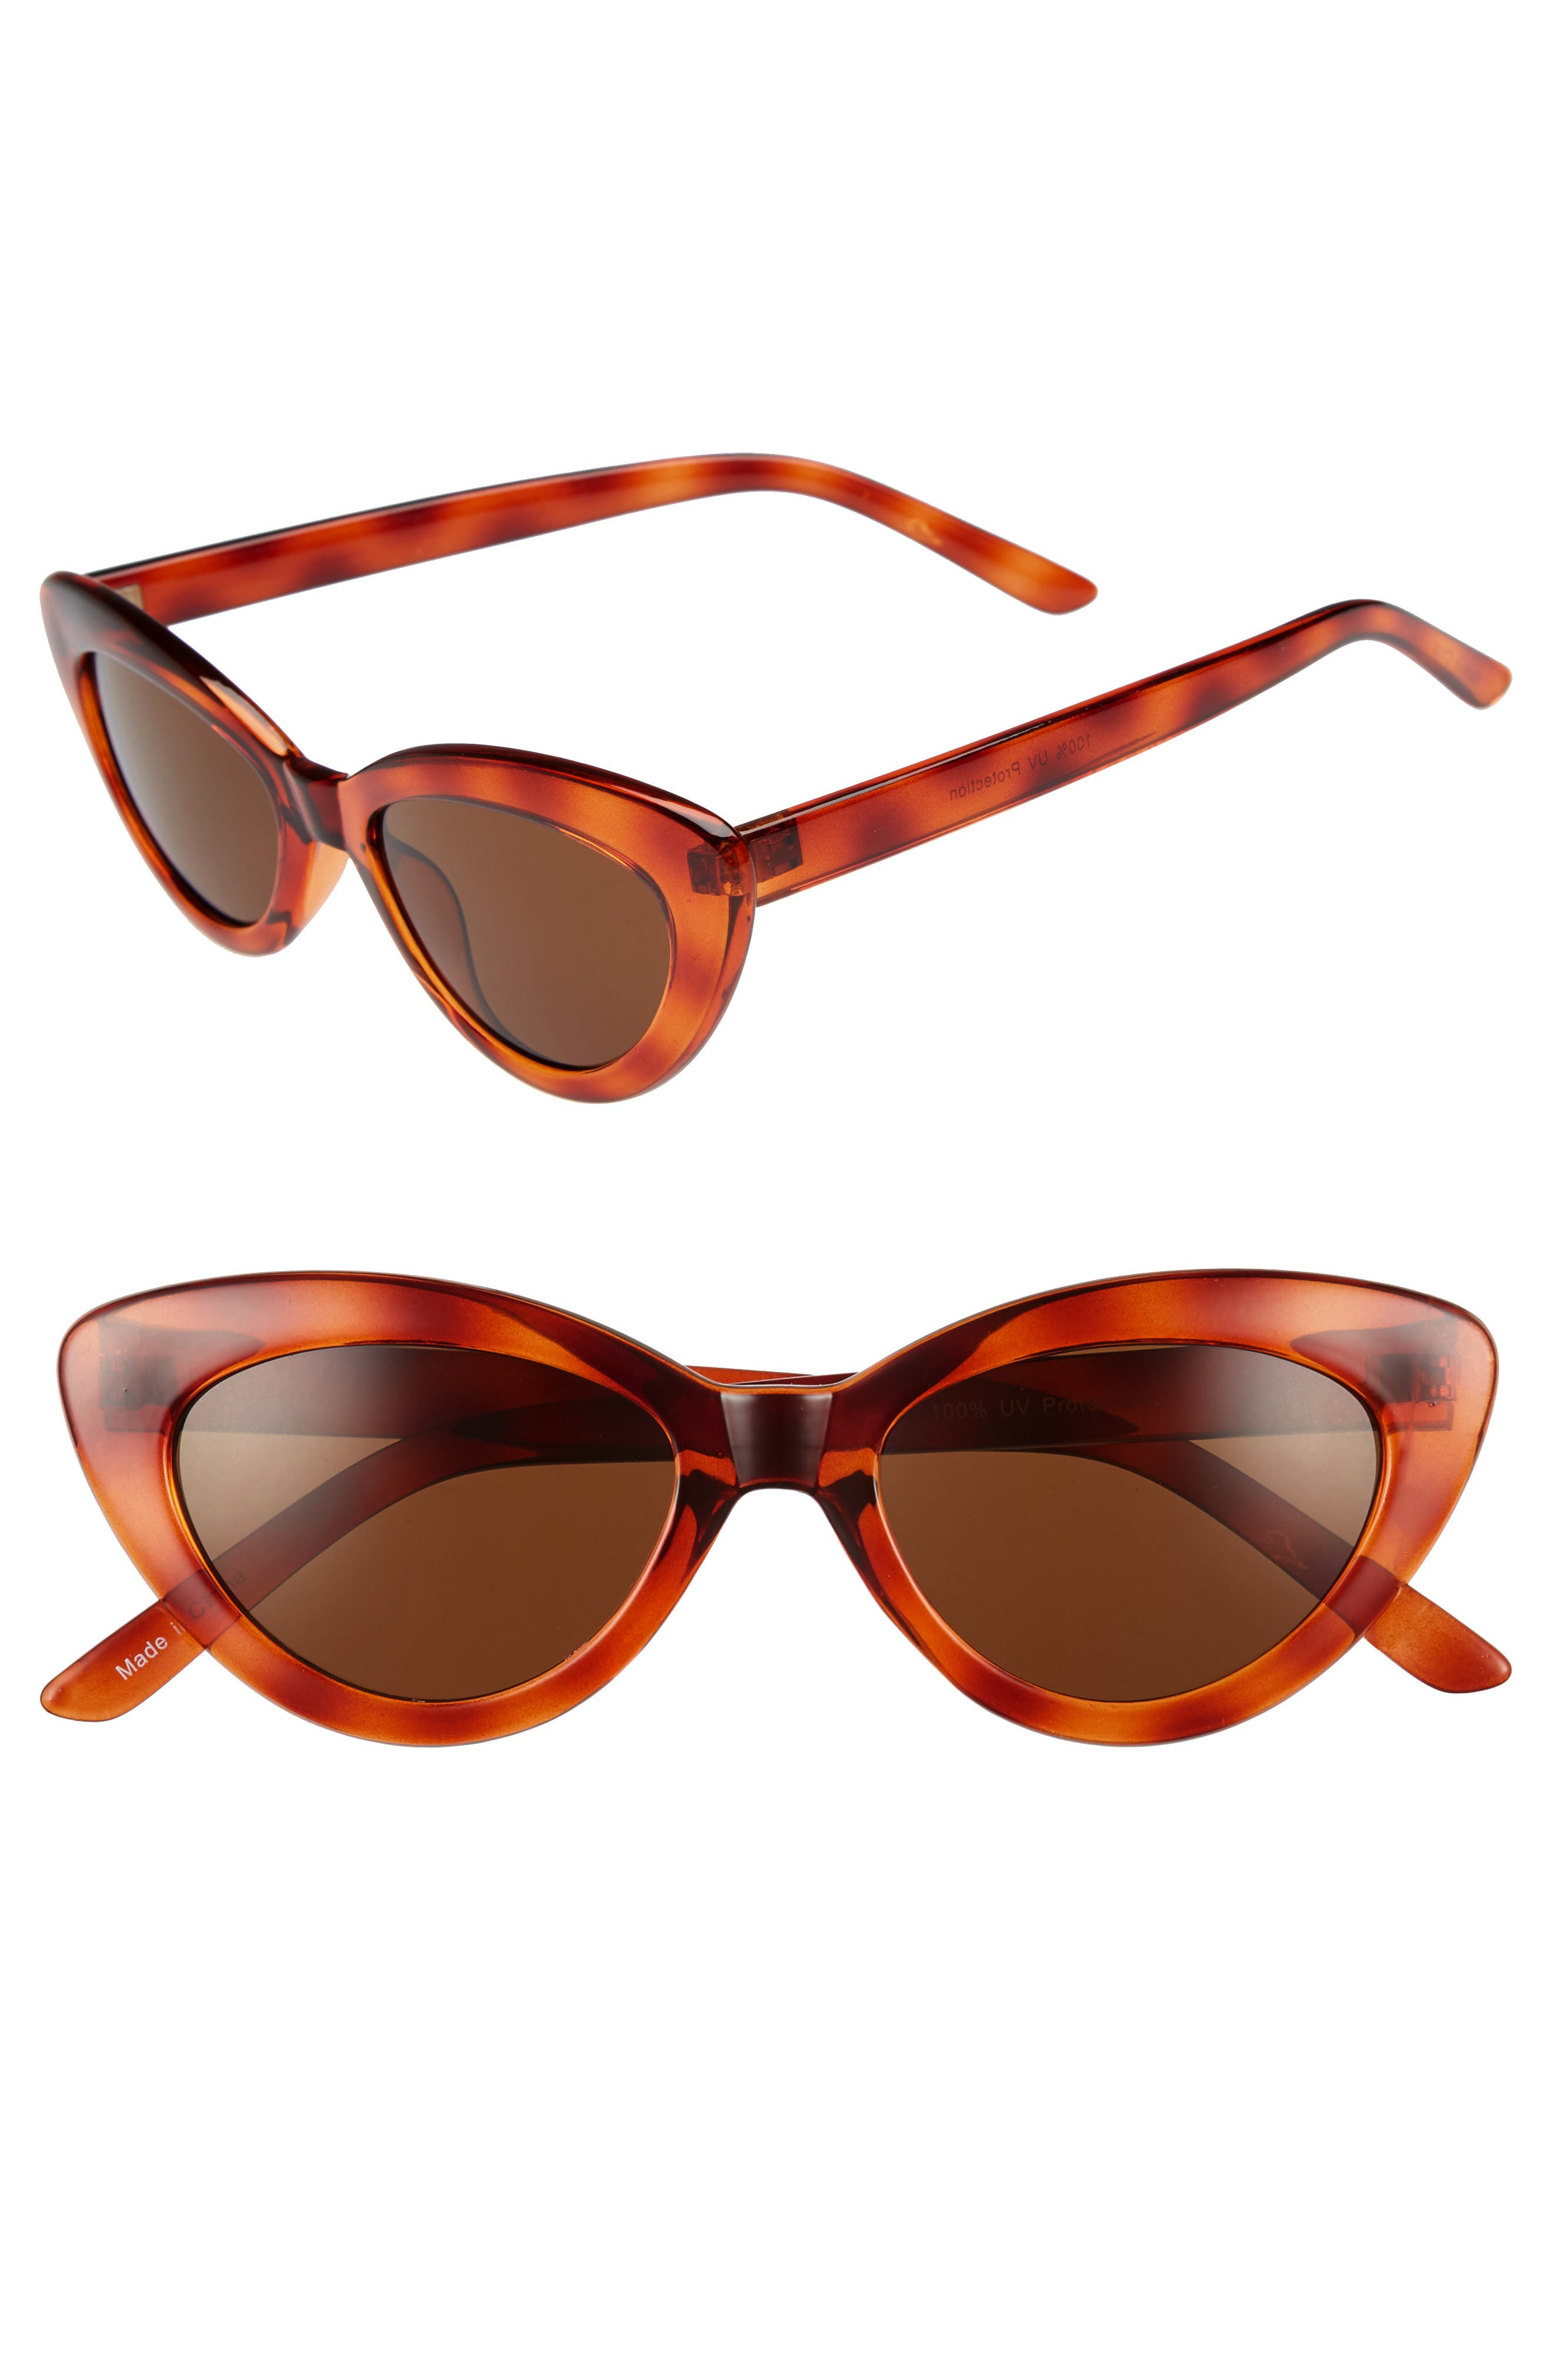 Retro Sunglasses | Vintage Glasses | New Vintage Eyeglasses Womens Bp. 51Mm Cat Eye Sunglasses - Tort $14.00 AT vintagedancer.com